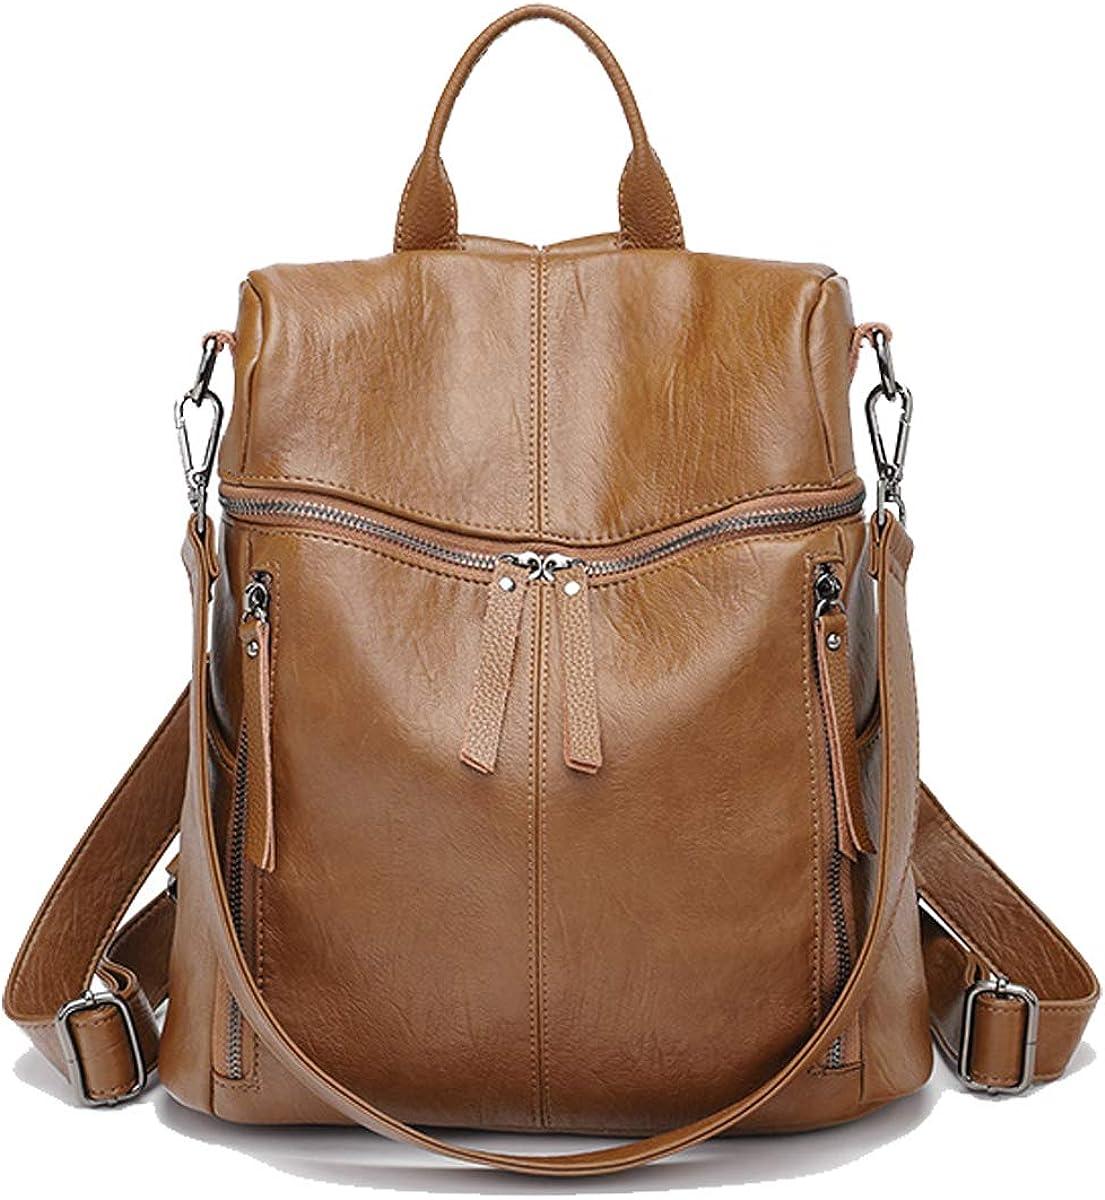 Tisdaini Women's wholesale Backpack Fashion leather casual teen sale Sho travel